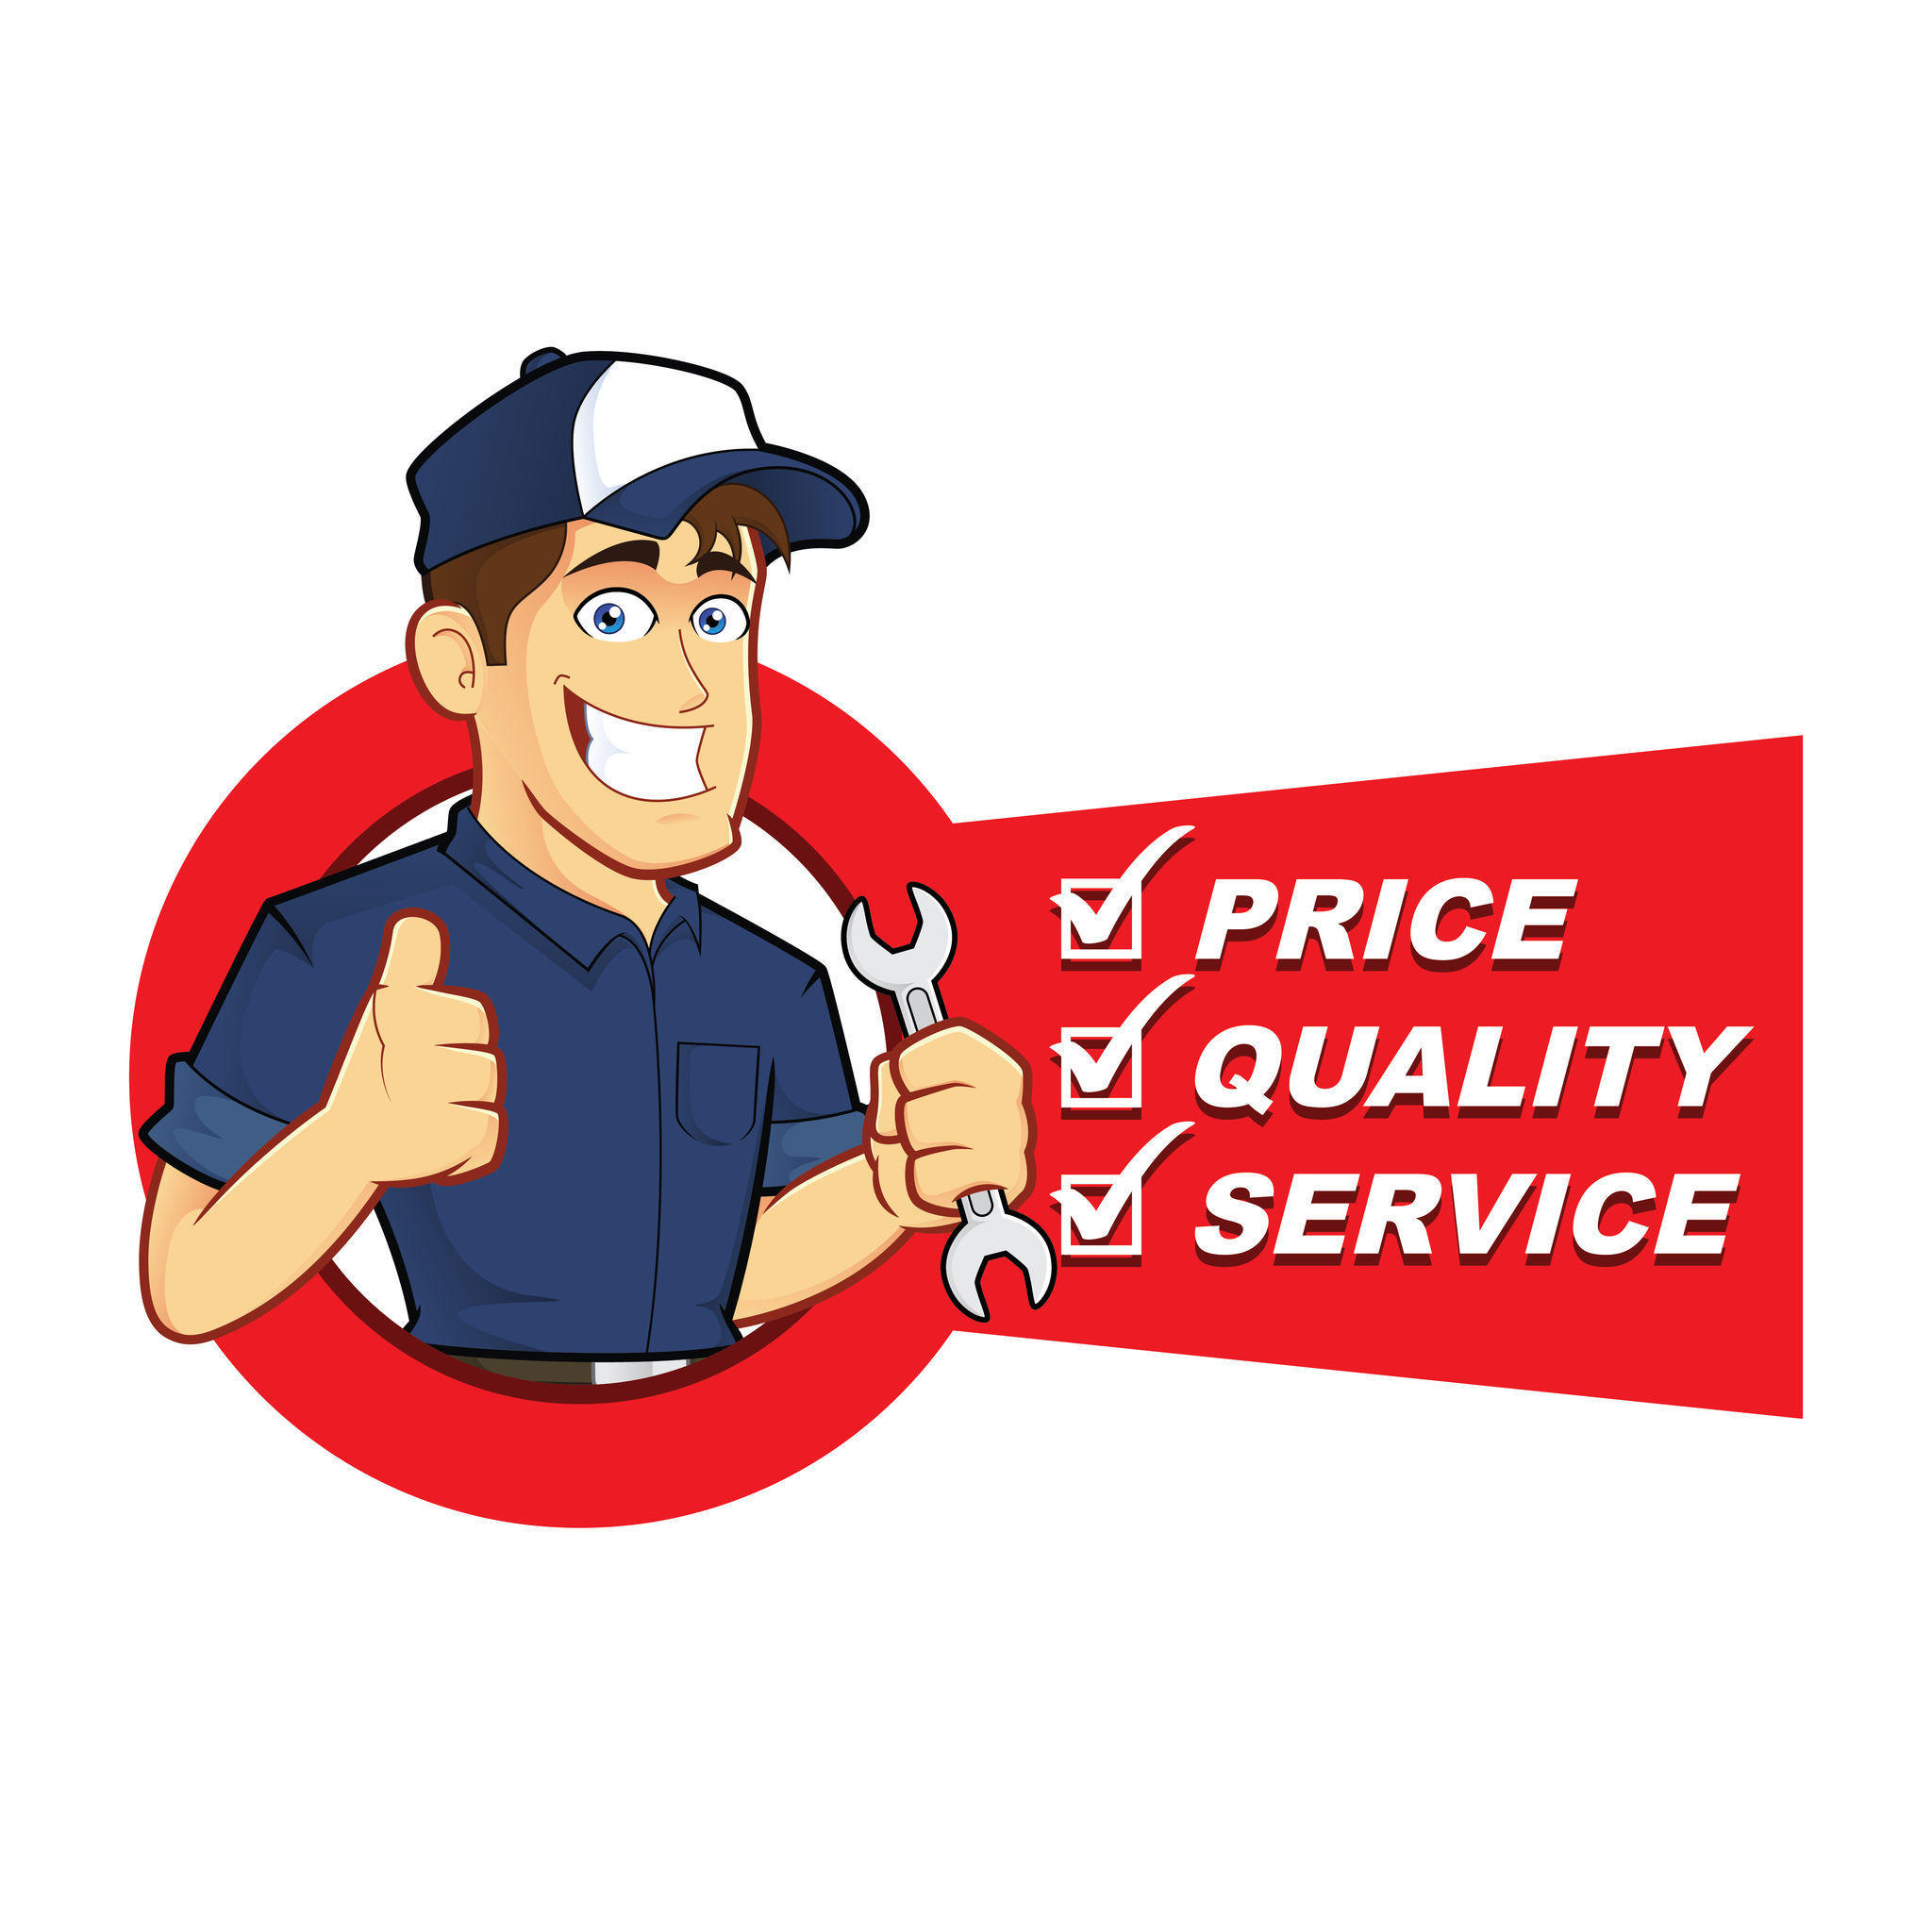 A1 Super Locksmith Services